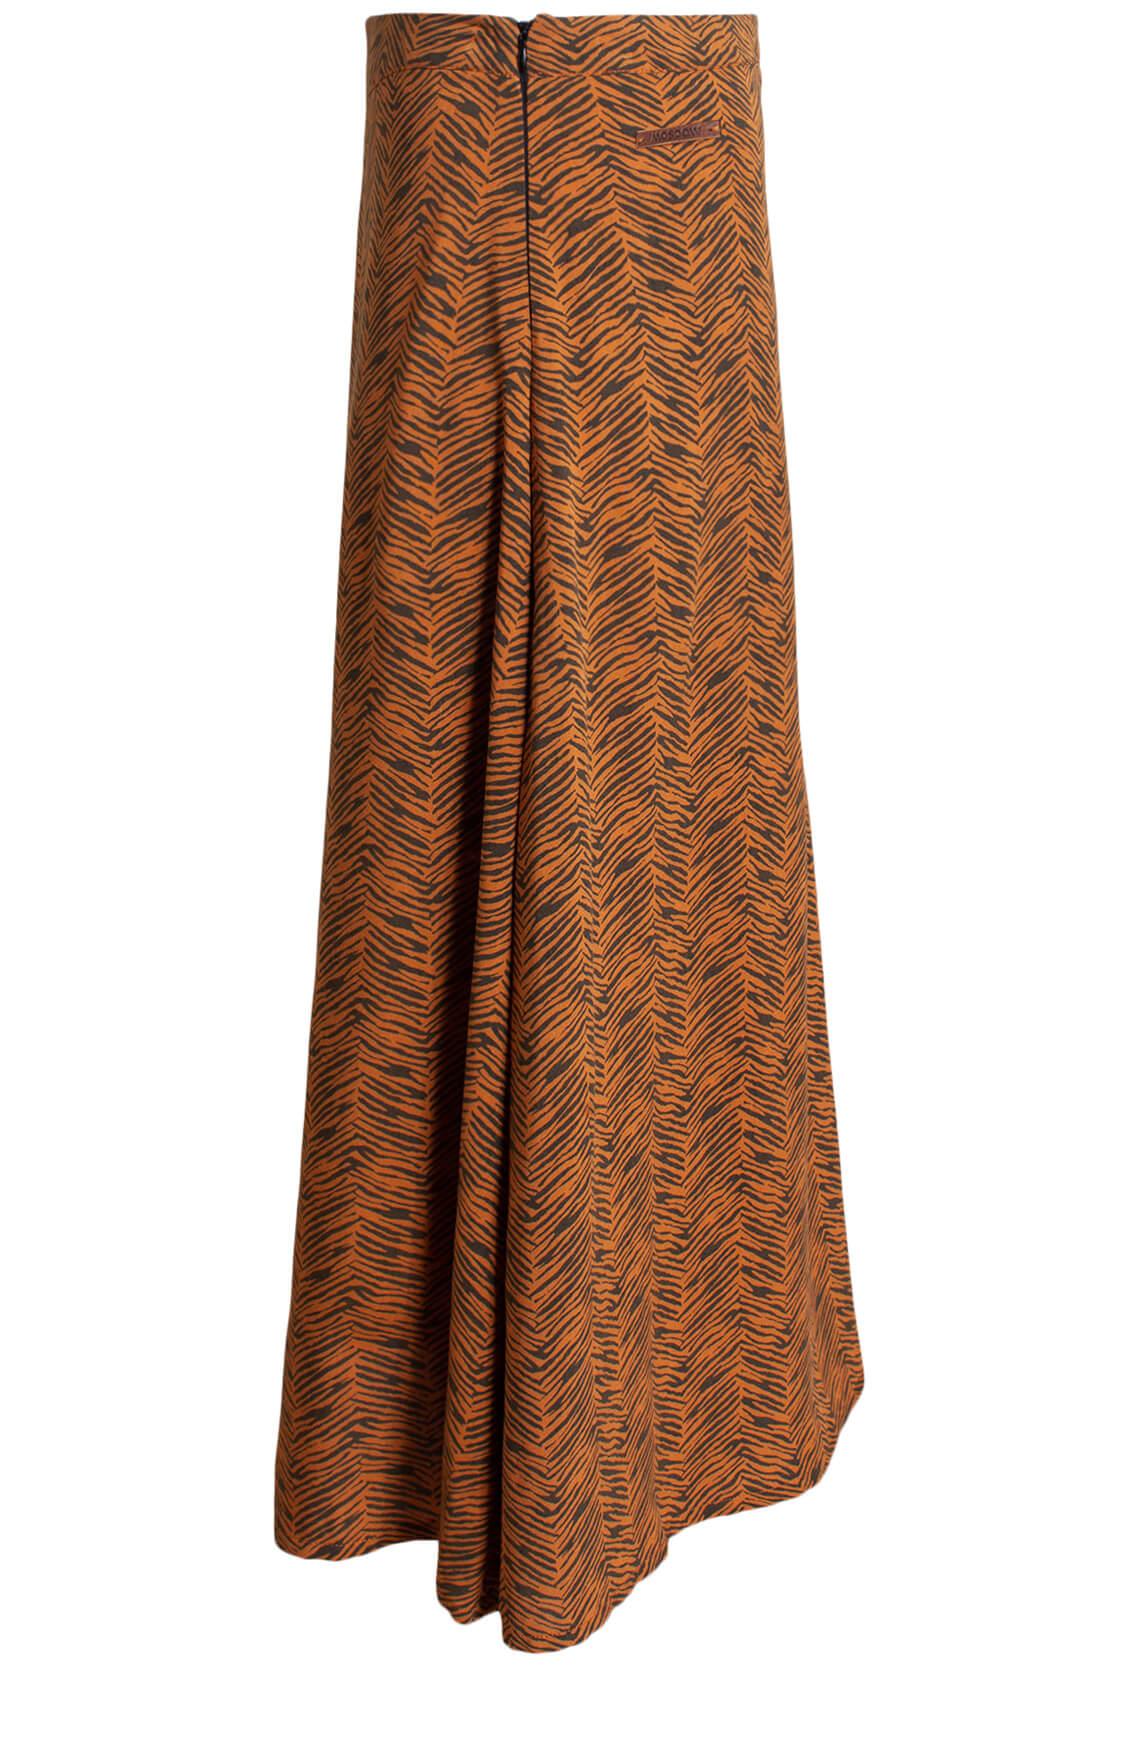 Moscow Dames Ivanya printed skirt Bruin